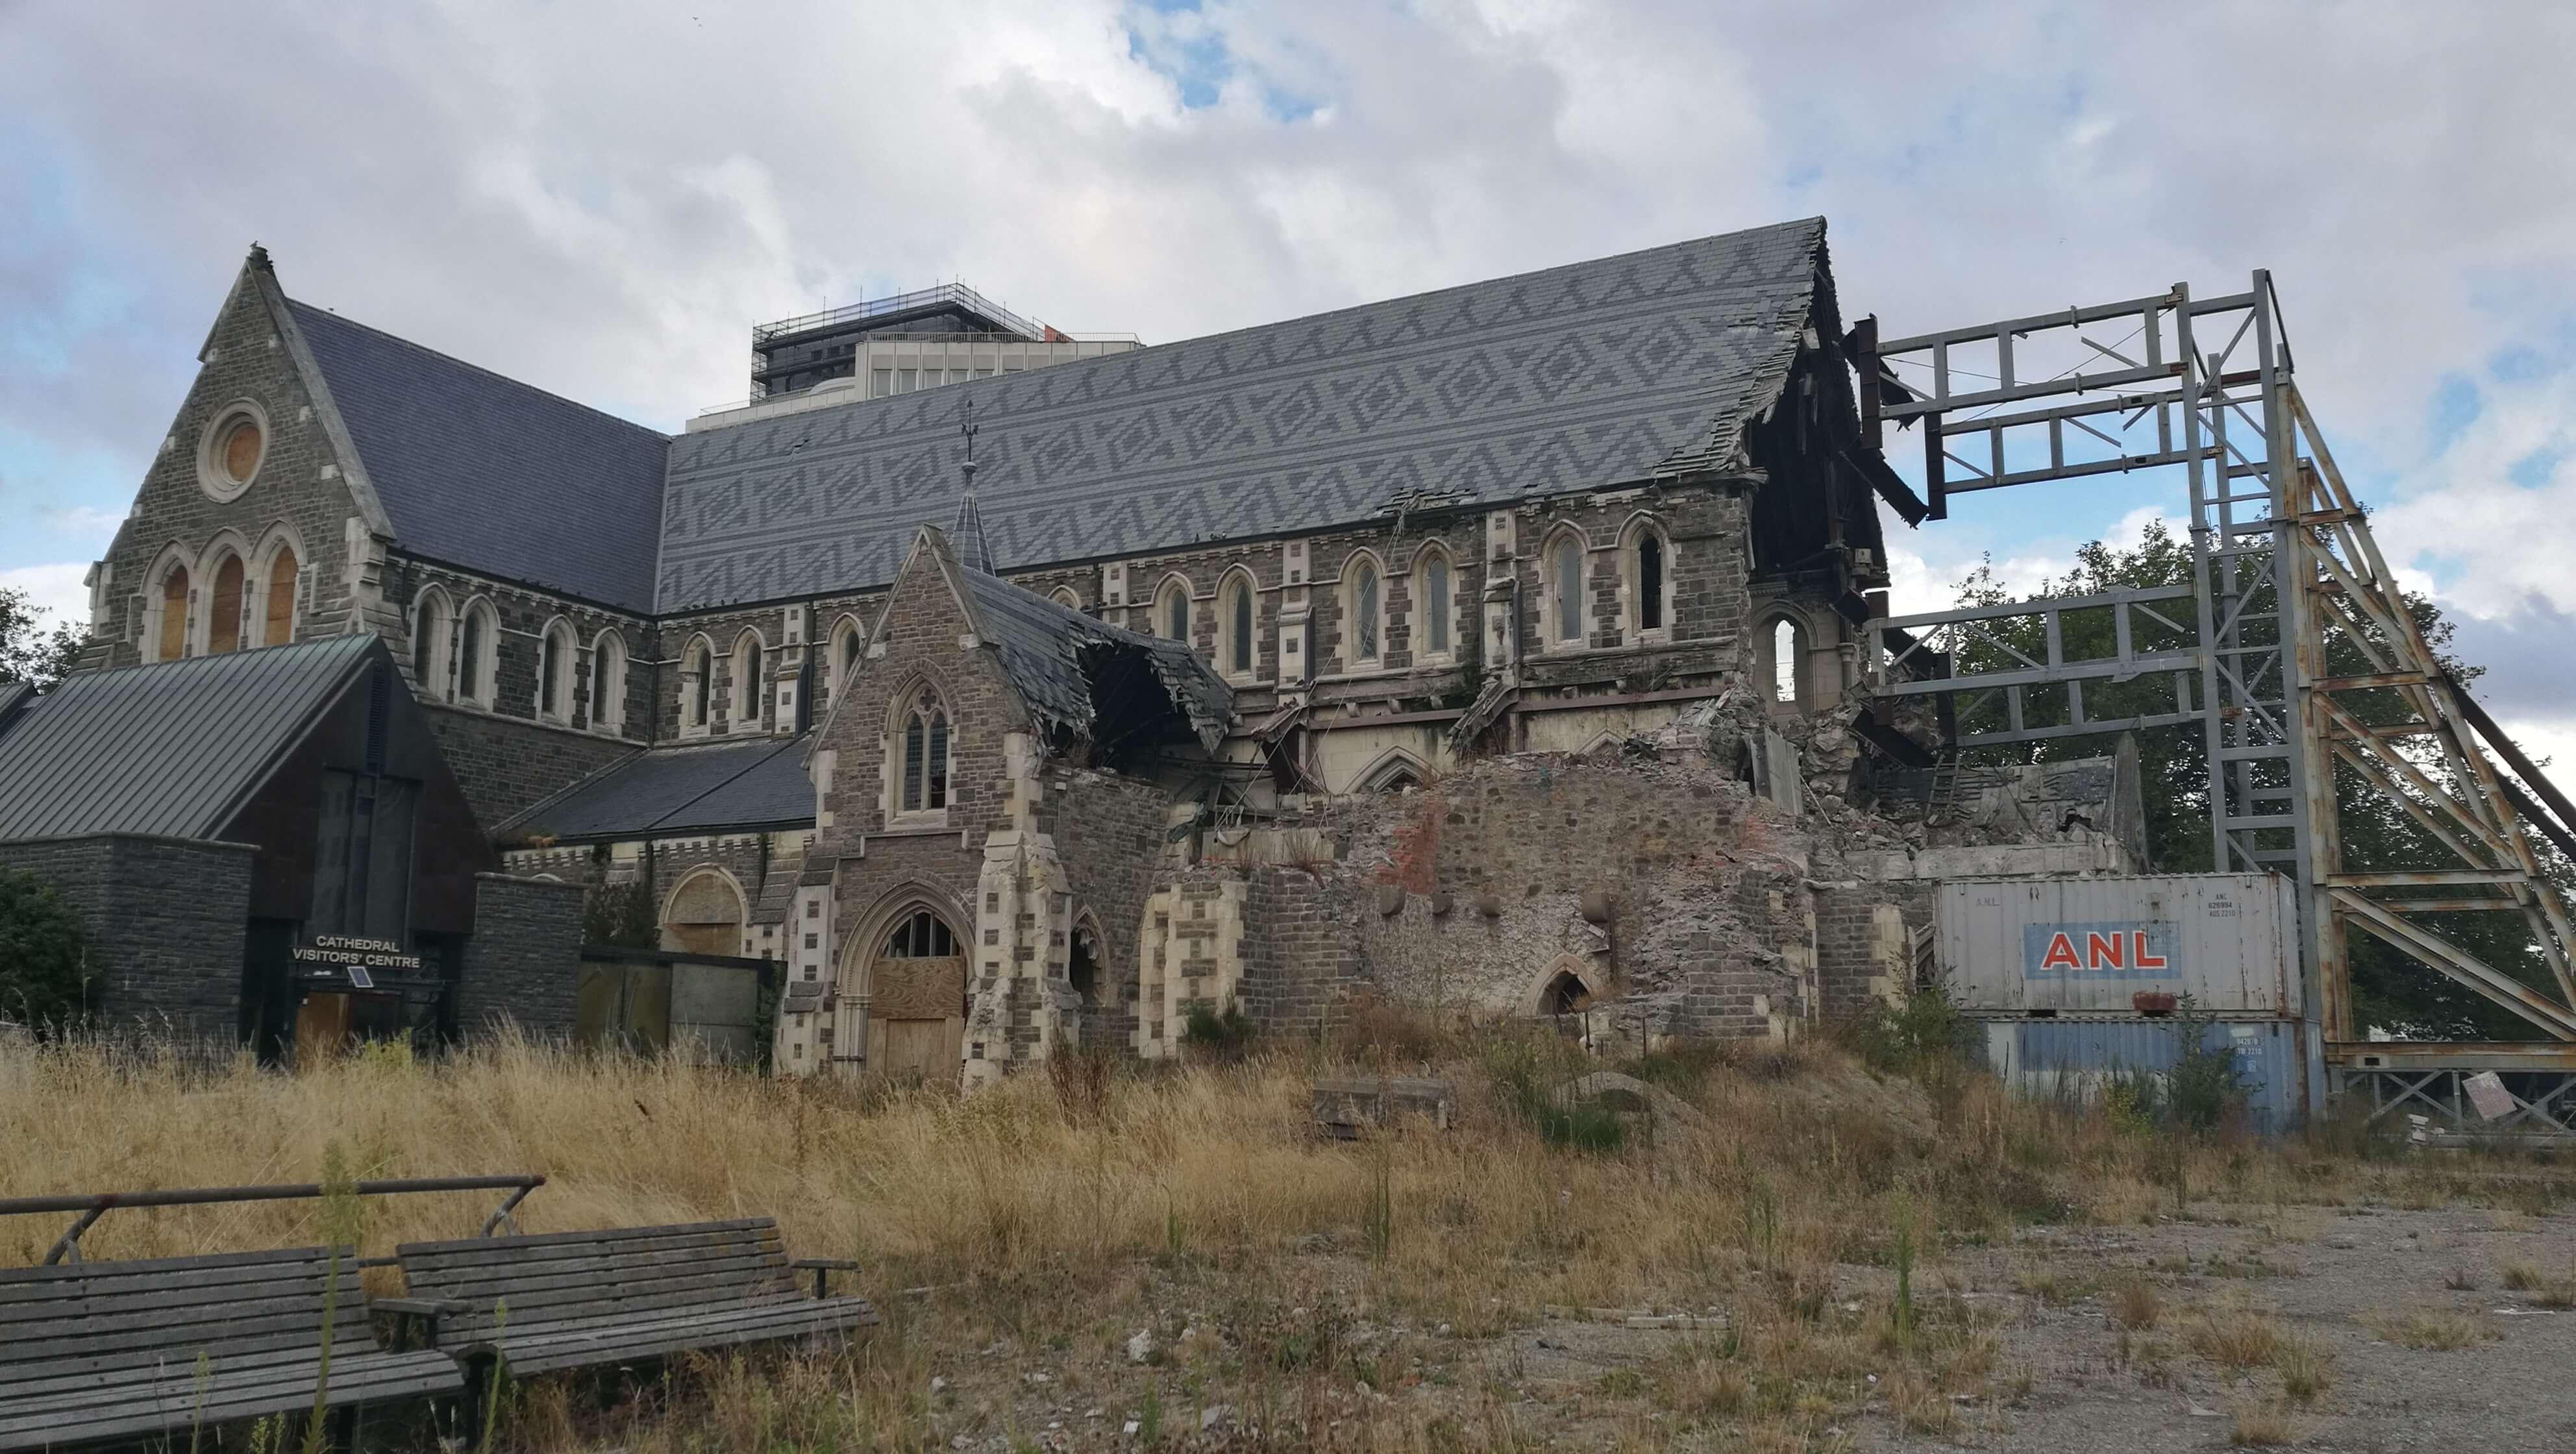 baufällige Kirche